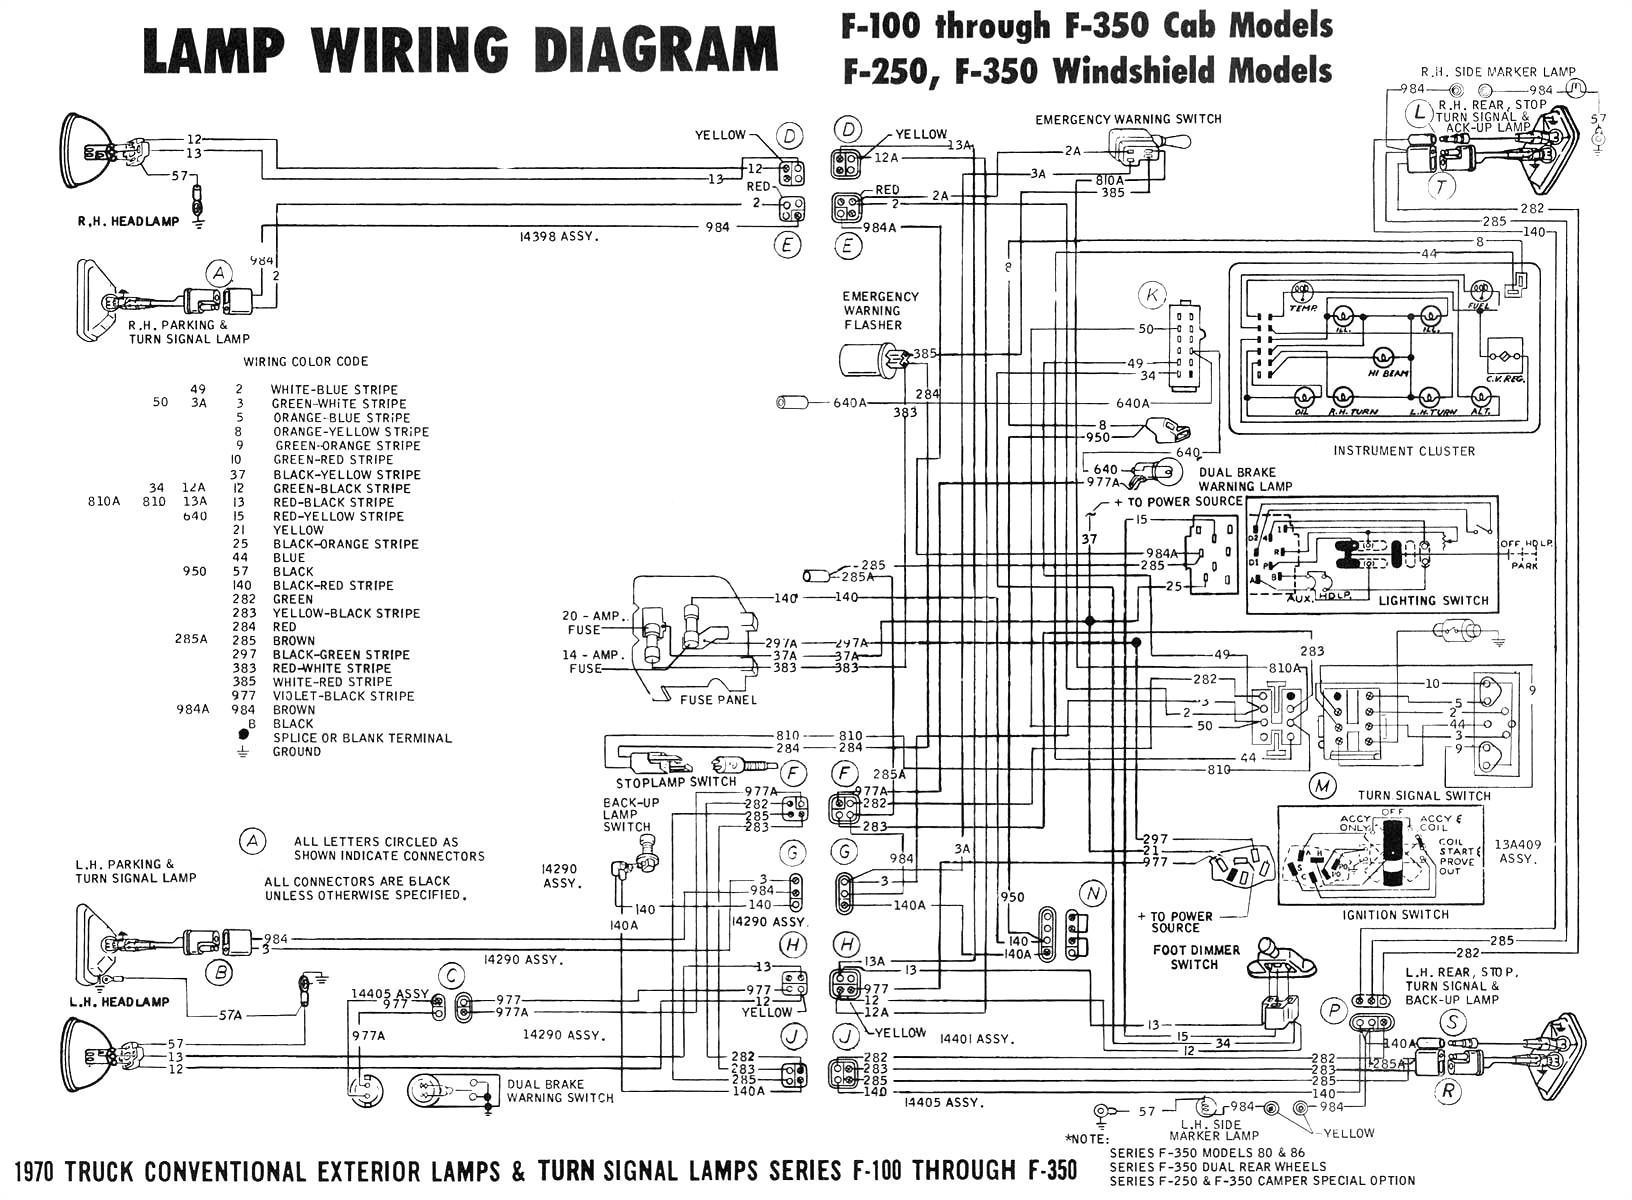 1980 Corvette Wiring Diagram 1978 Peterbilt Wiring Backup Lights Wiring Diagrams Ments